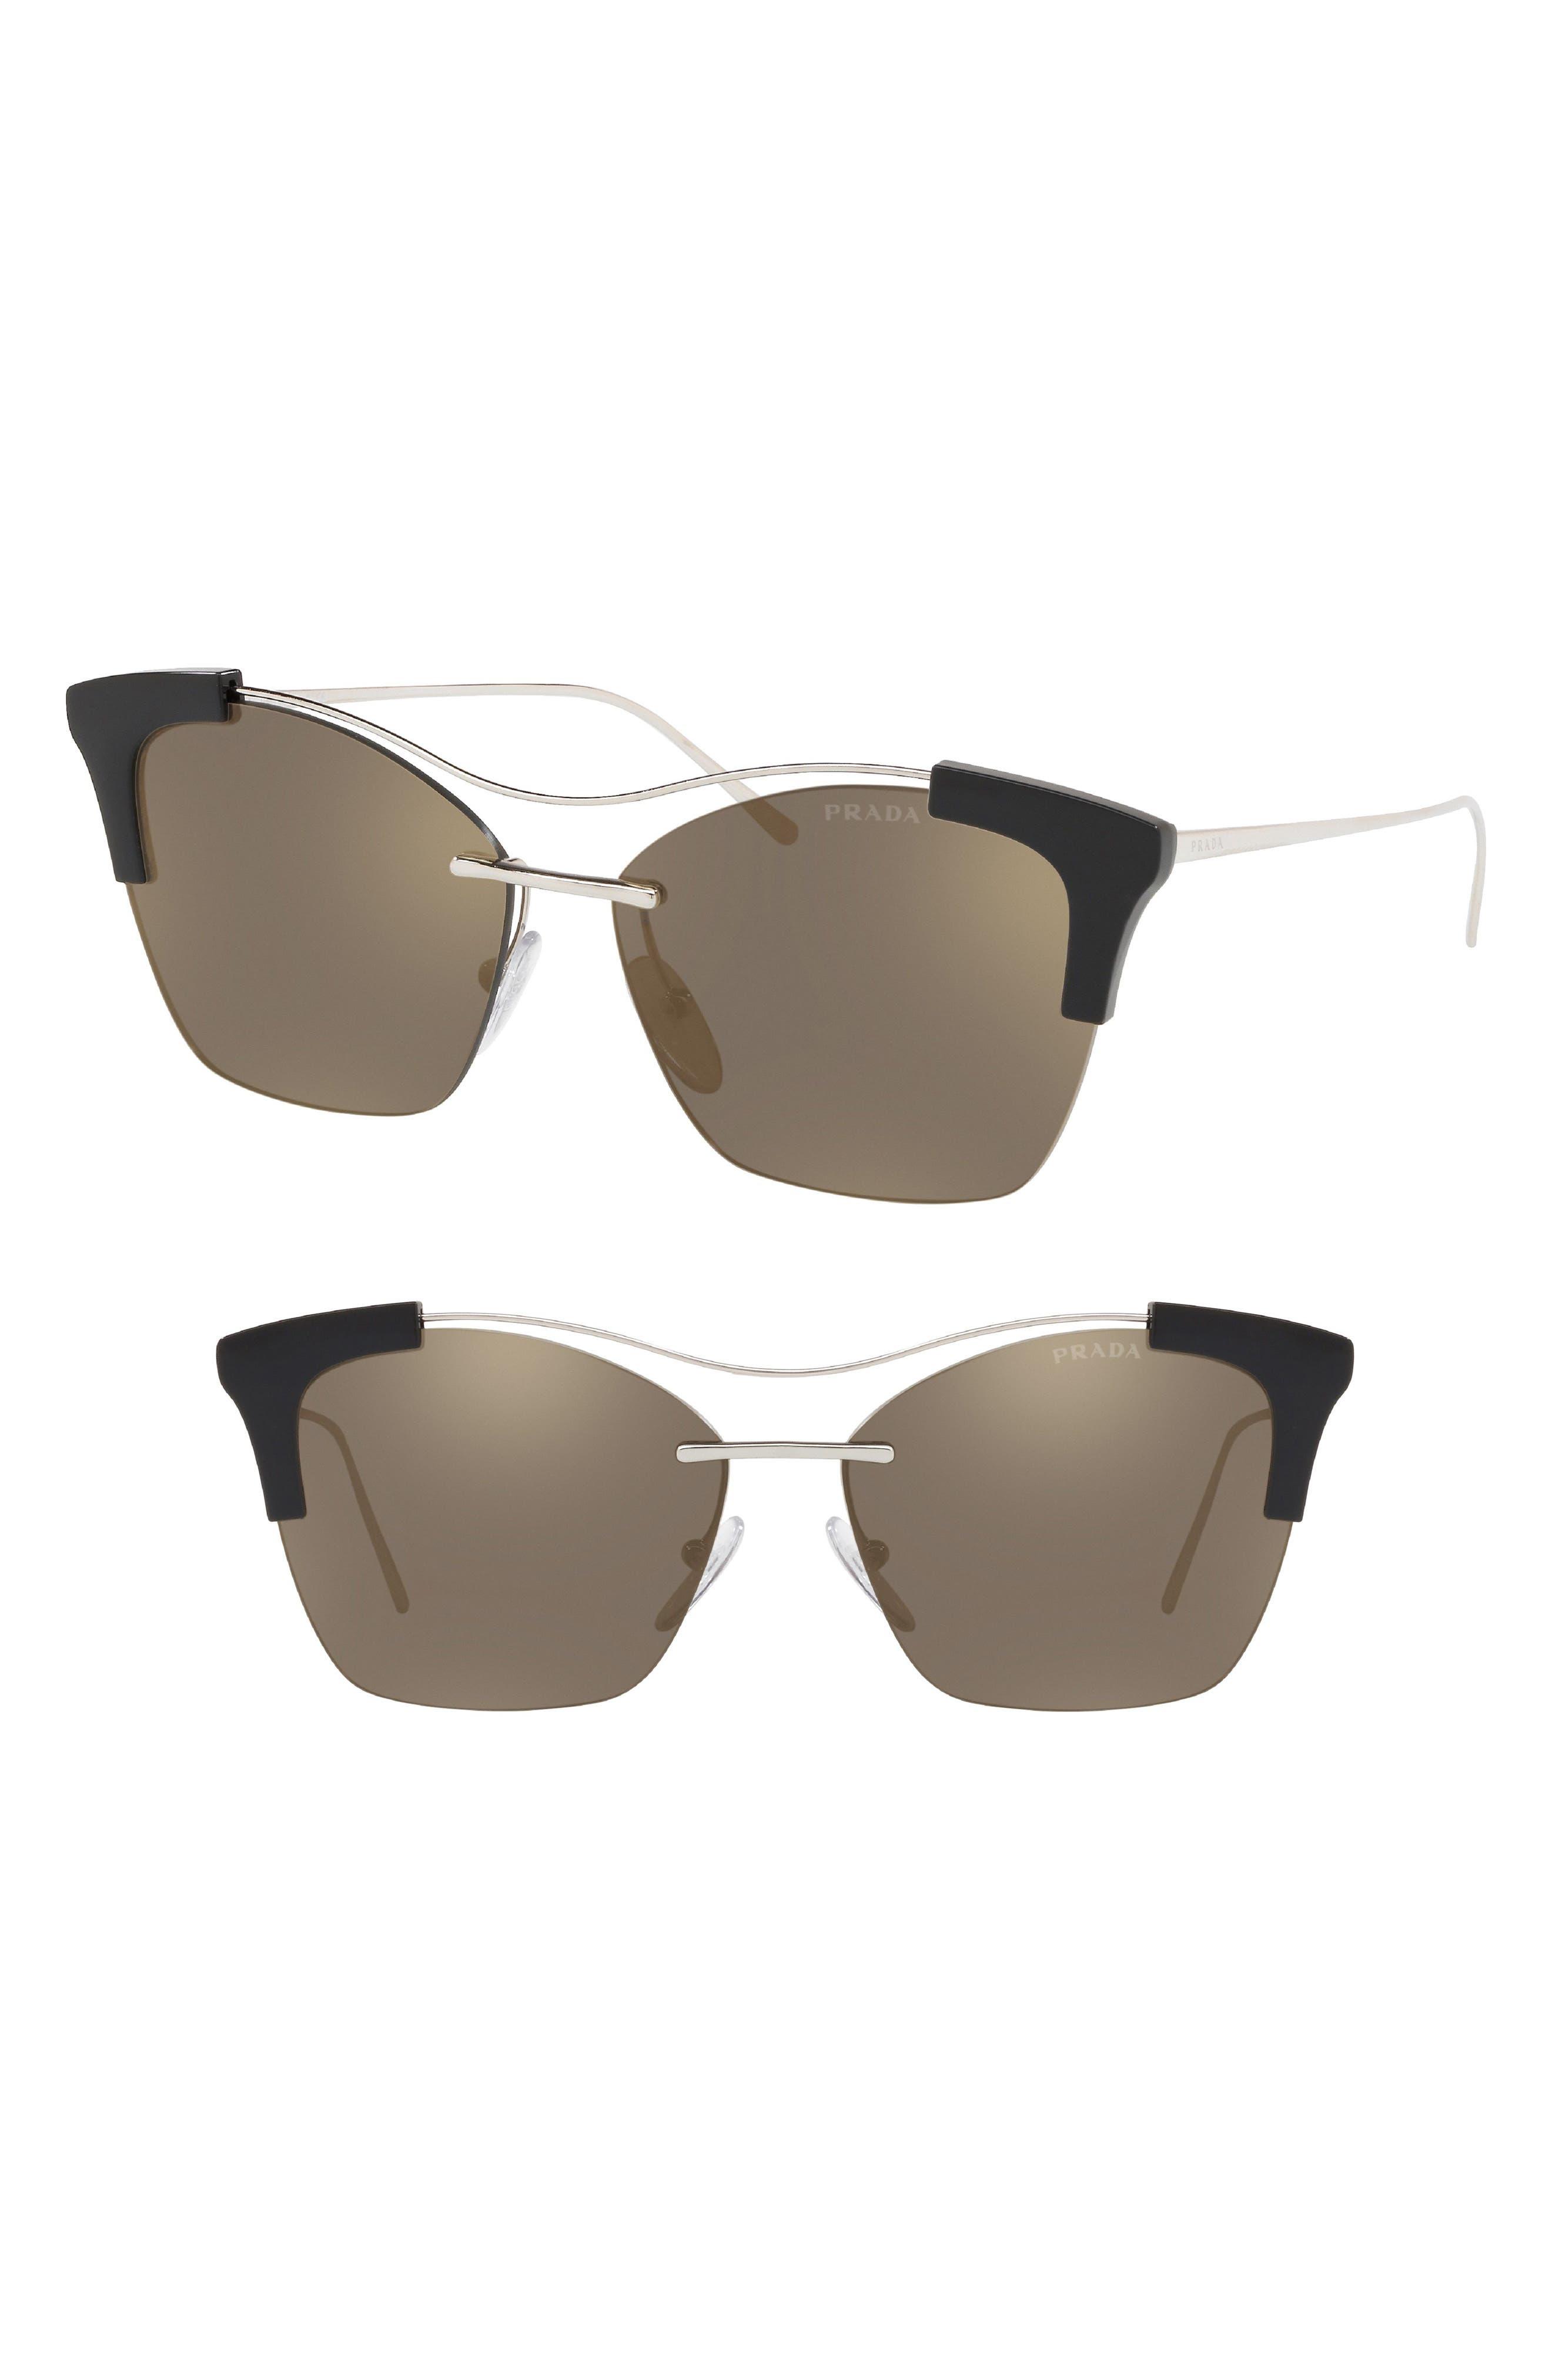 1df2d8cb189a5 Women s Sale Sunglasses   Readers